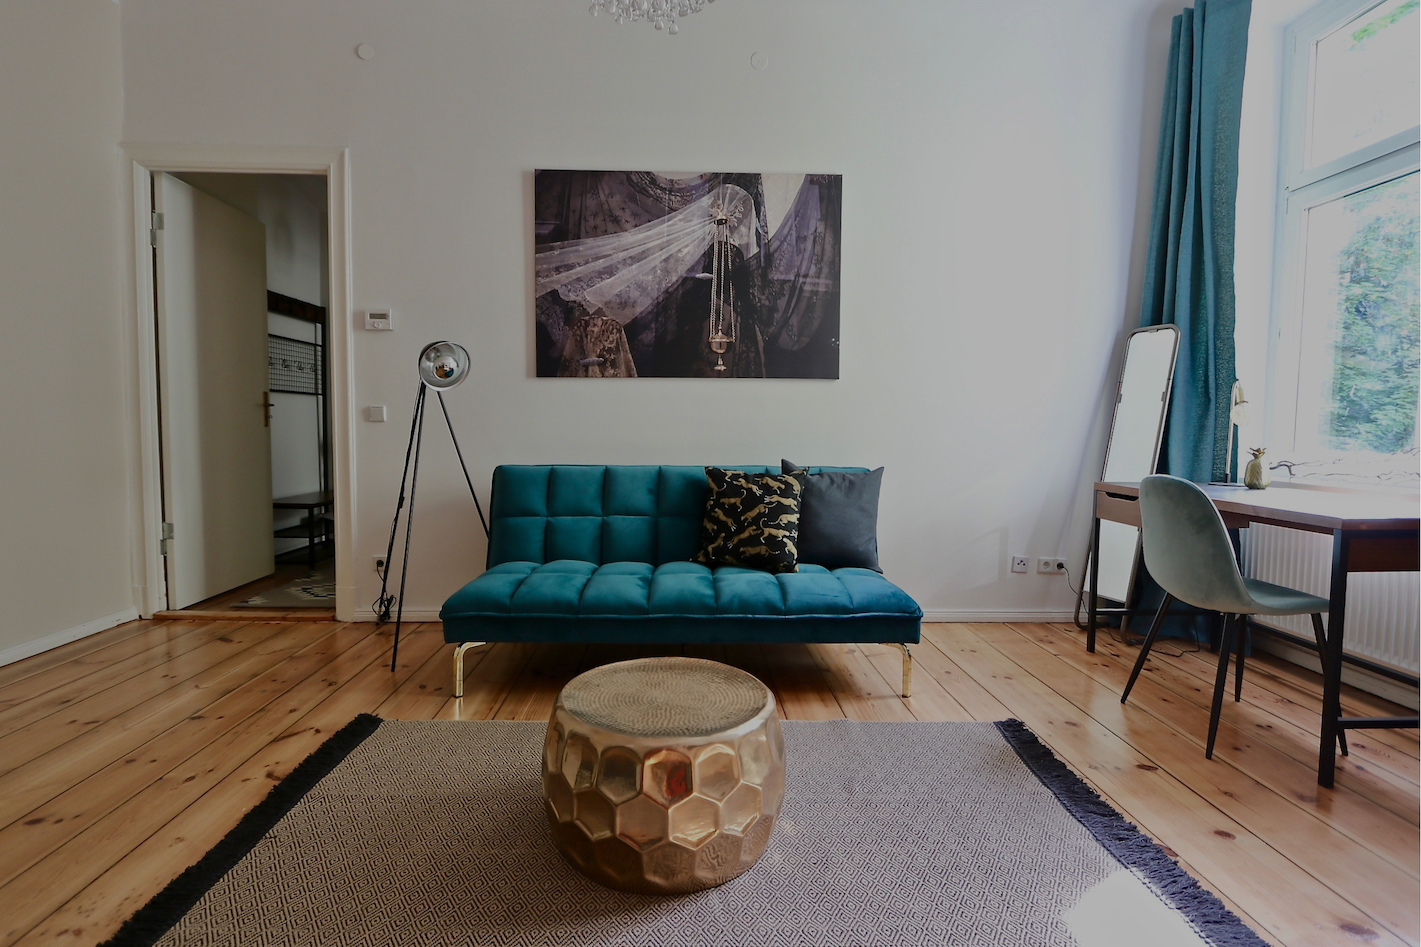 Appartement-Berlin Agence immobilière franco-allemande à Berlin